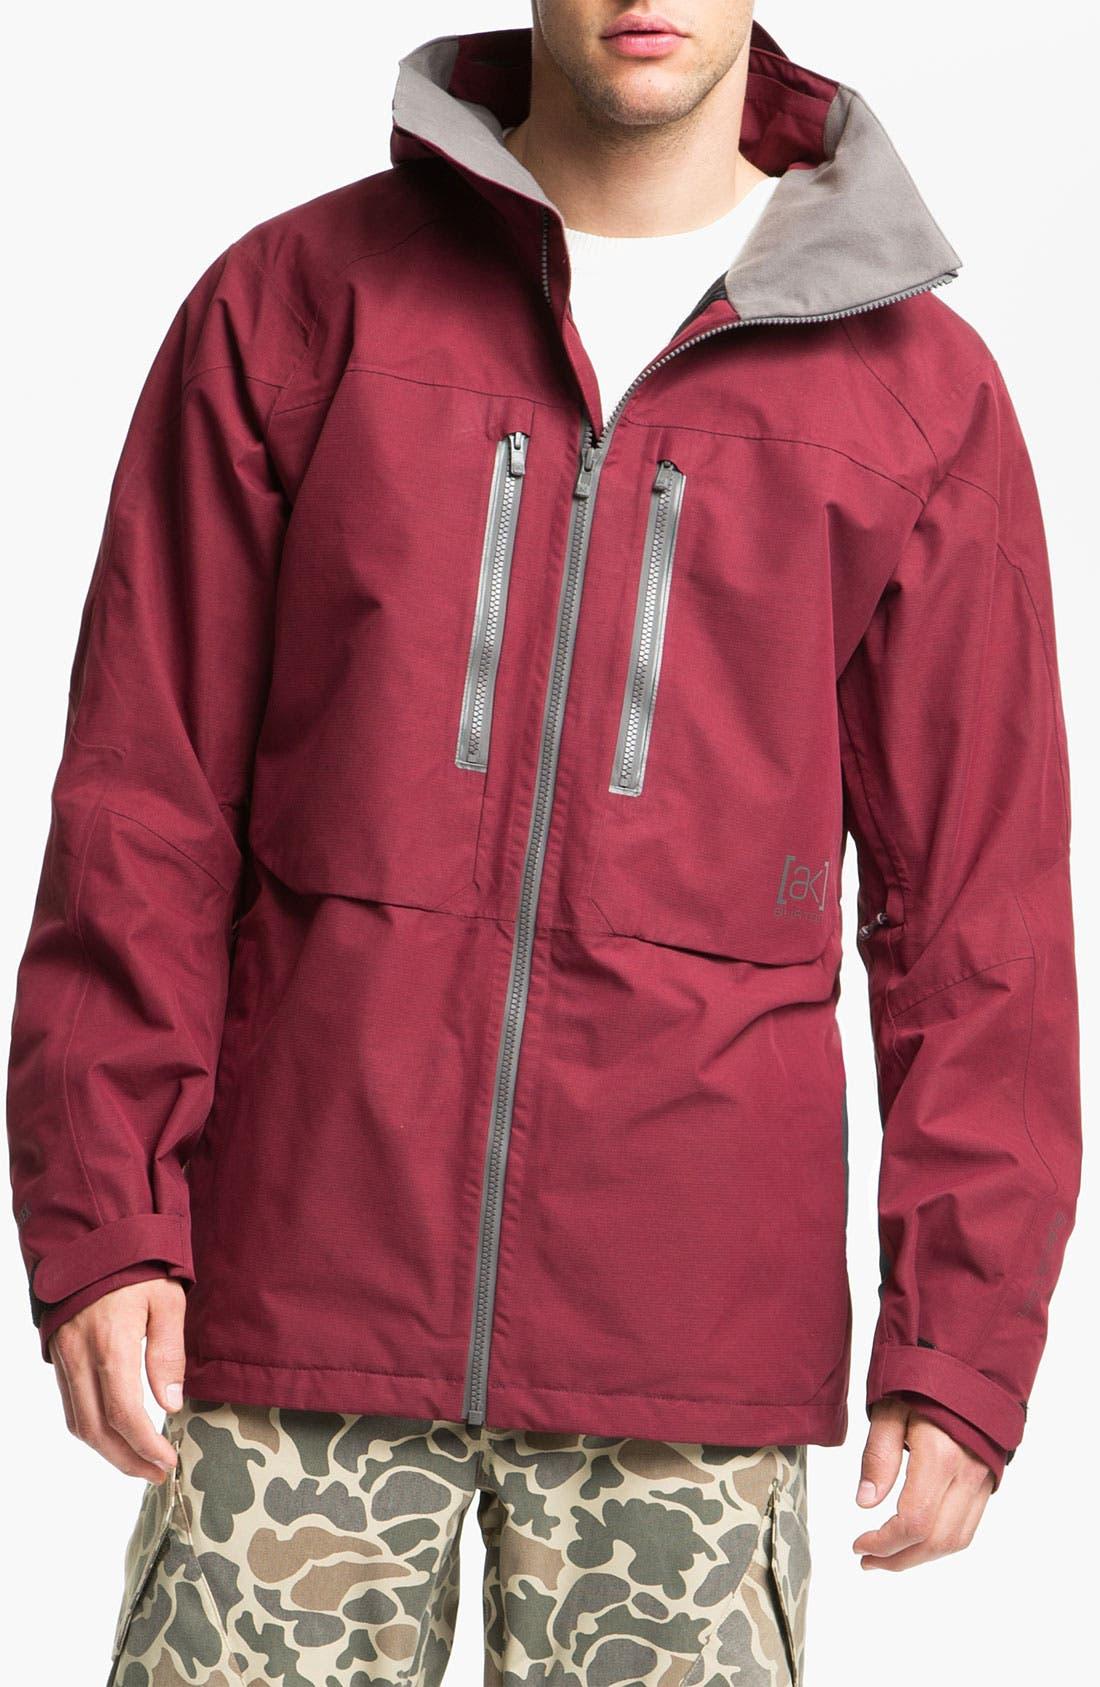 Alternate Image 1 Selected - Burton 'AK Stagger' Jacket